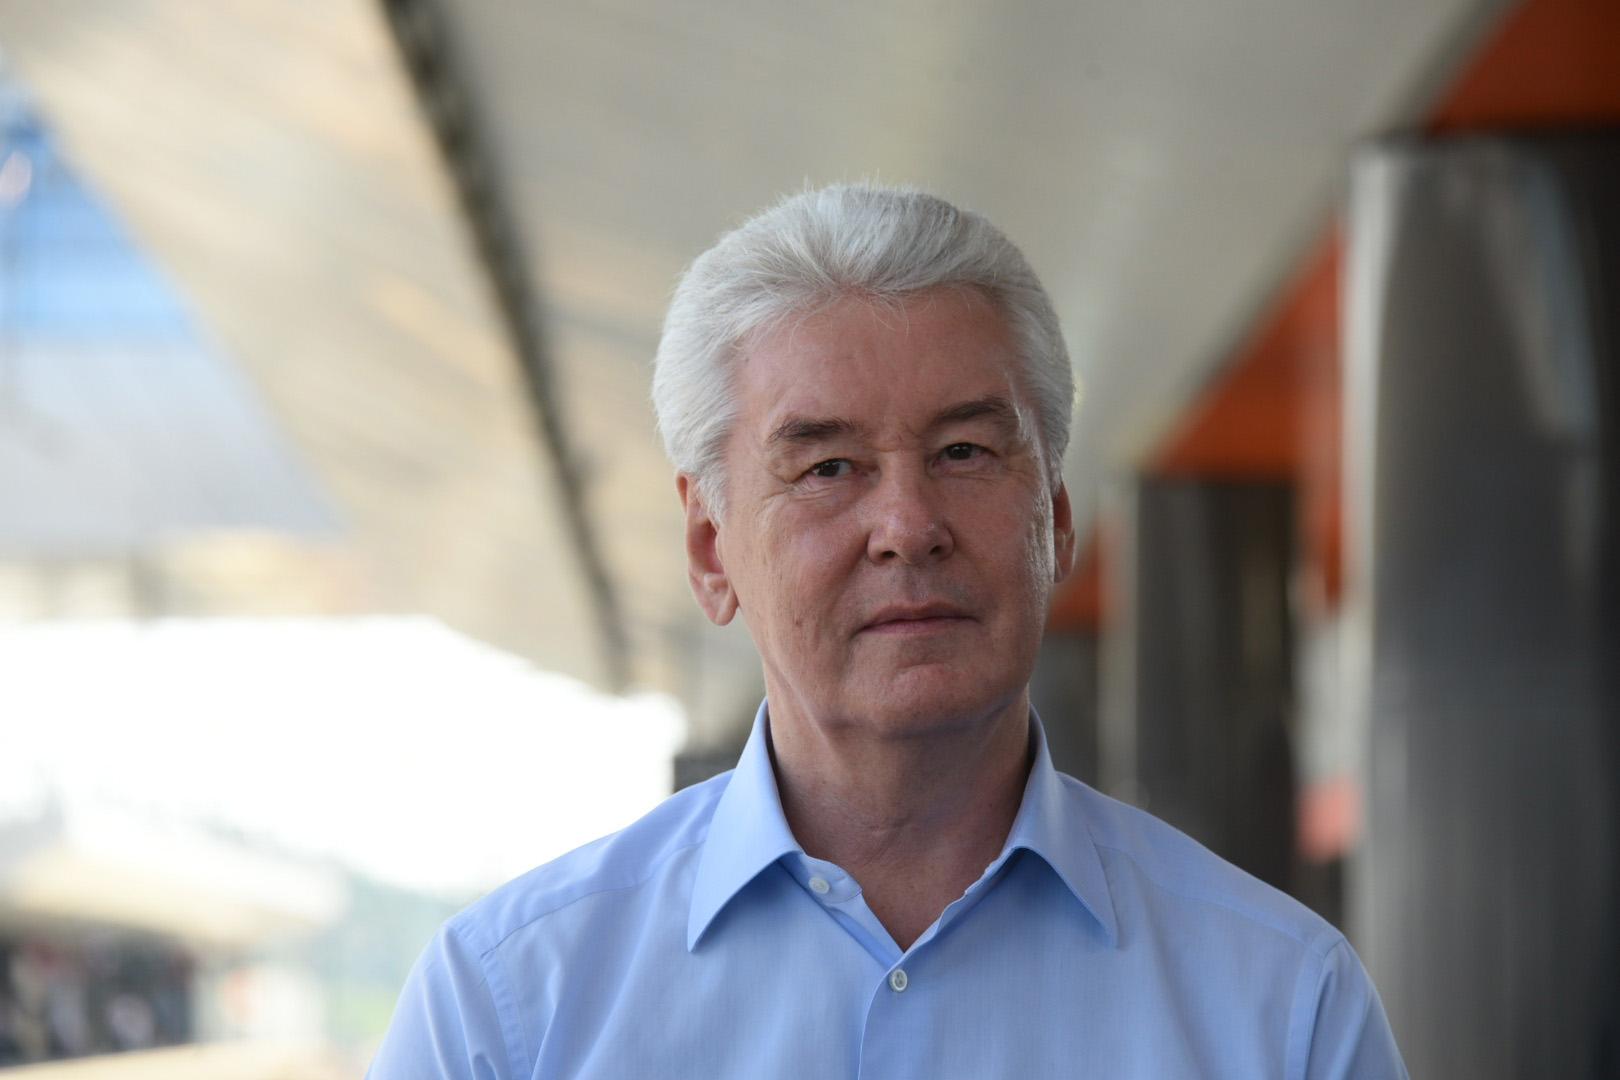 Собянин назвал сроки окончания строительства станции метро «Зюзино»